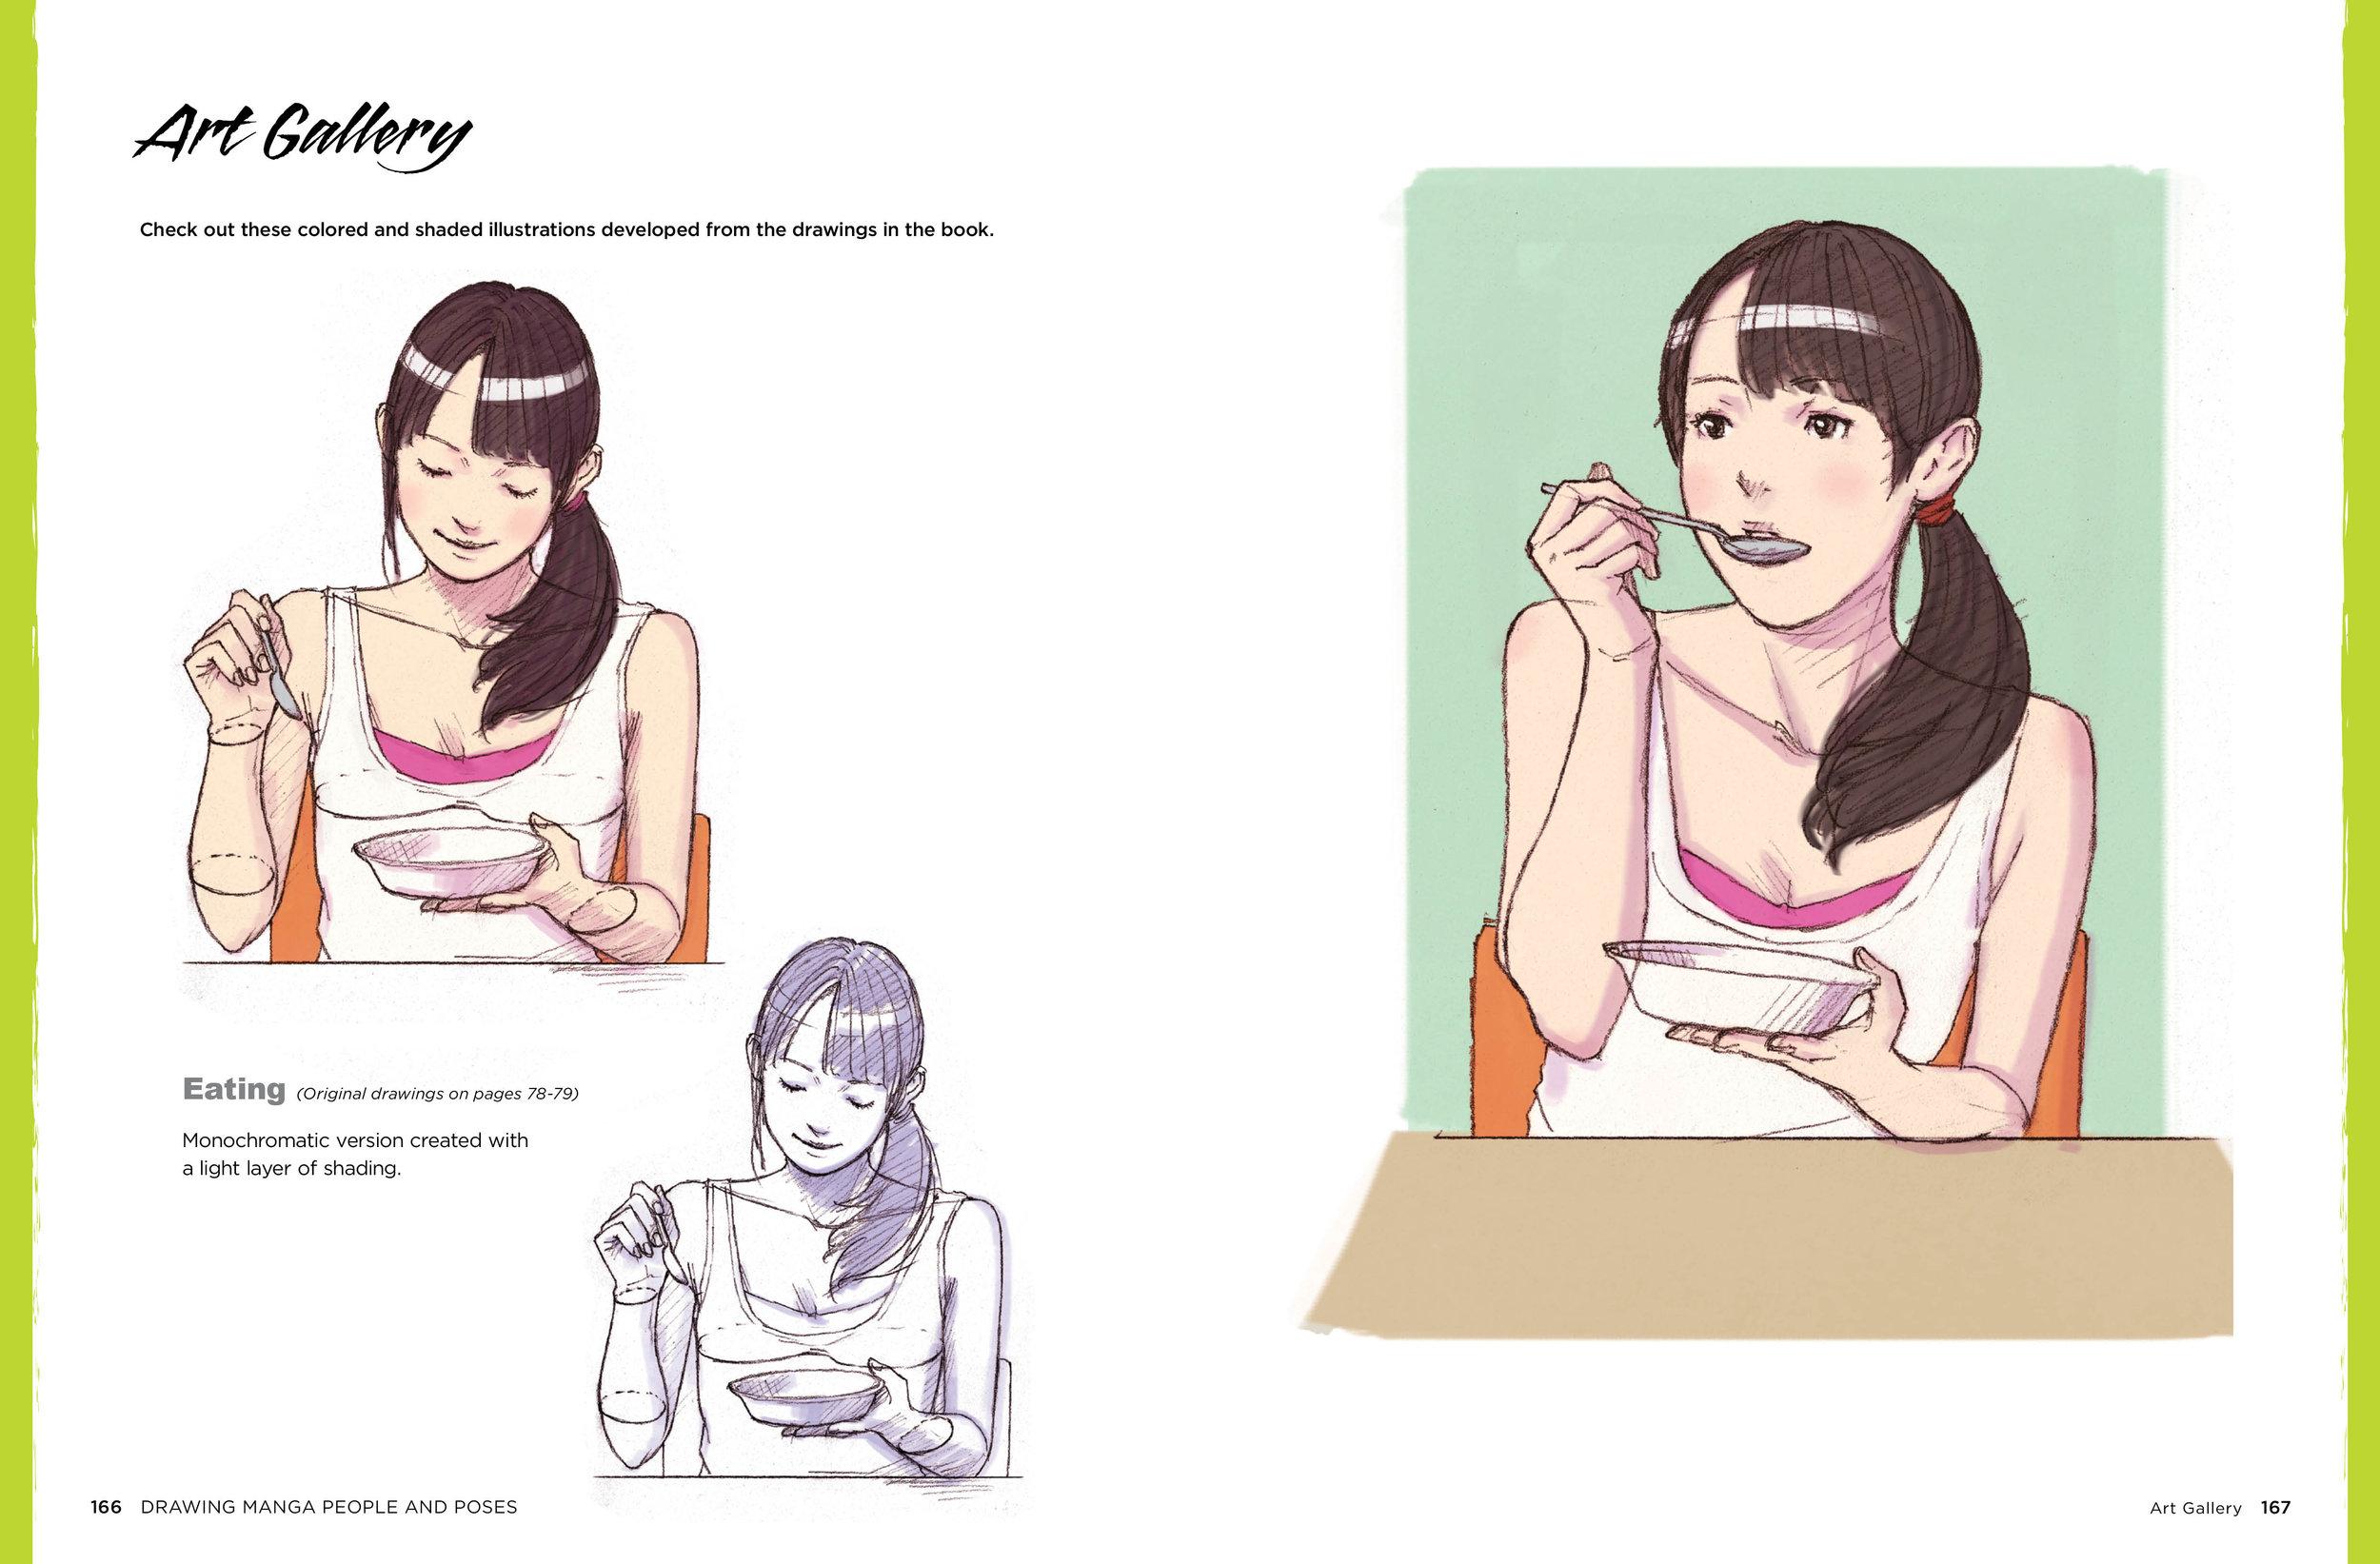 Manga People and Poses 166.167.jpg